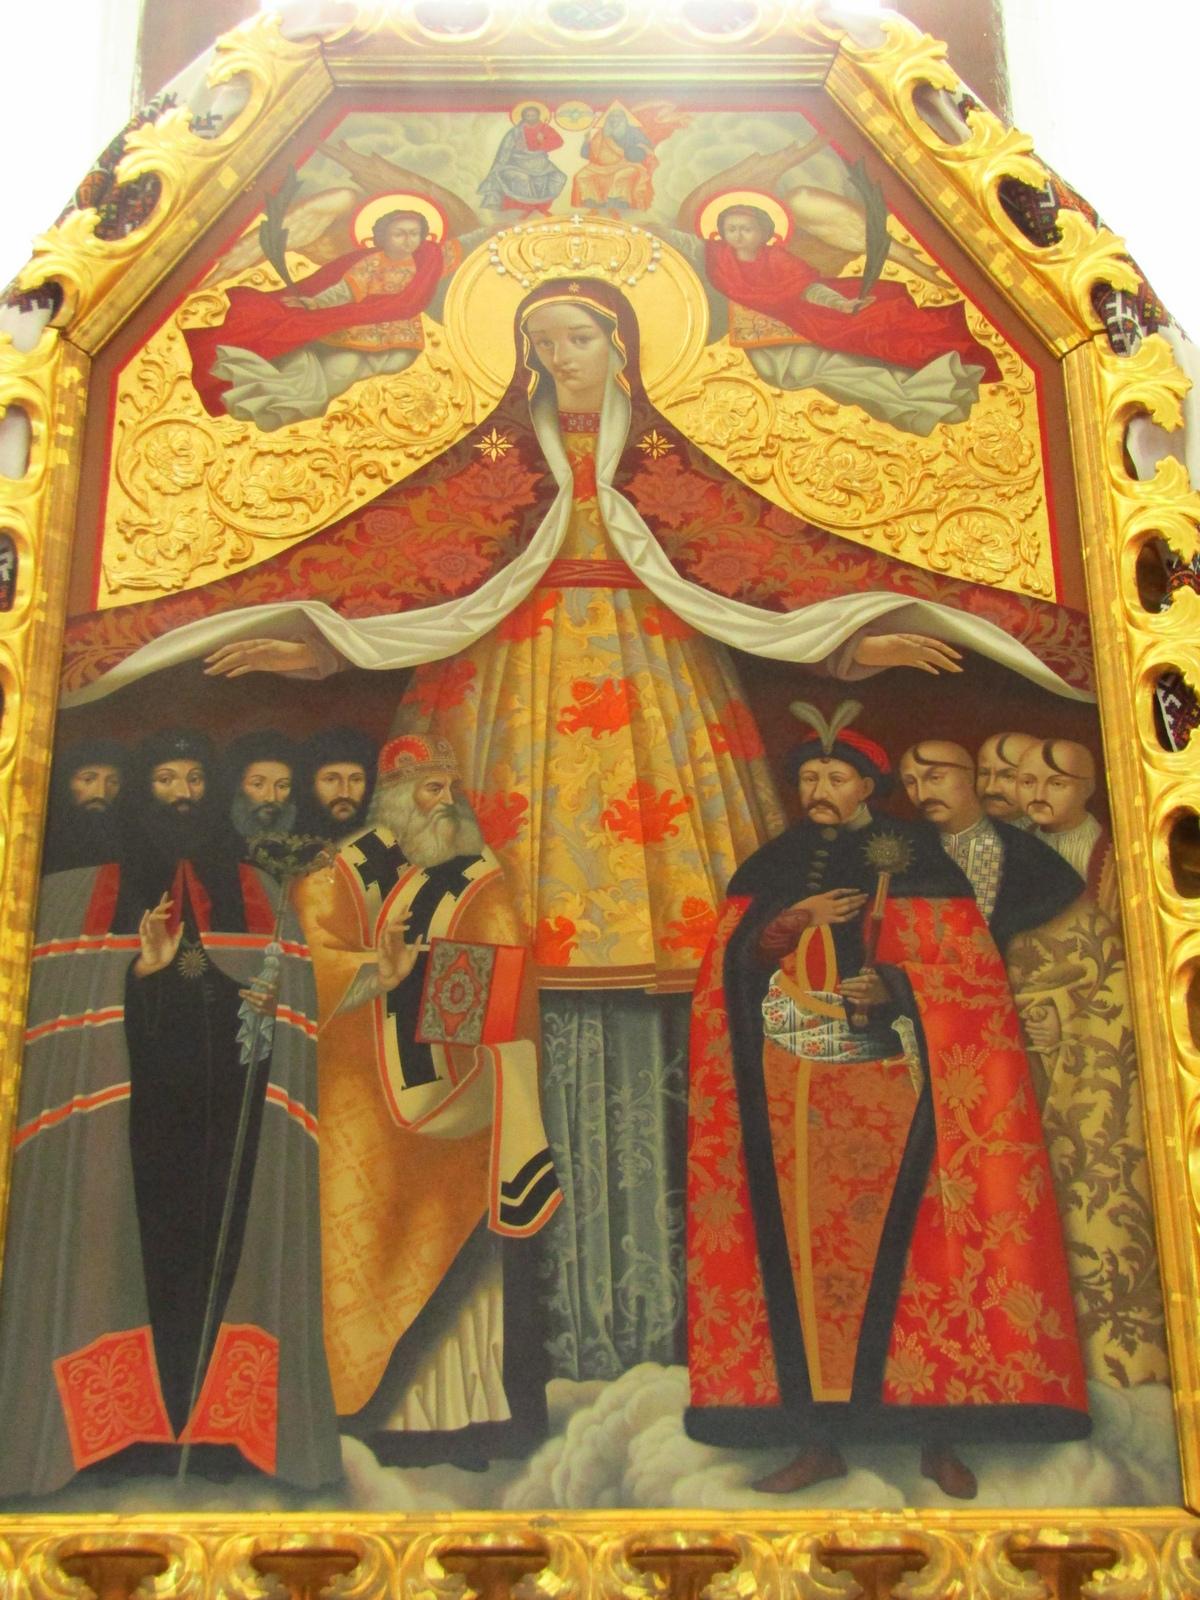 Ікона з Богданом Хмельницьким